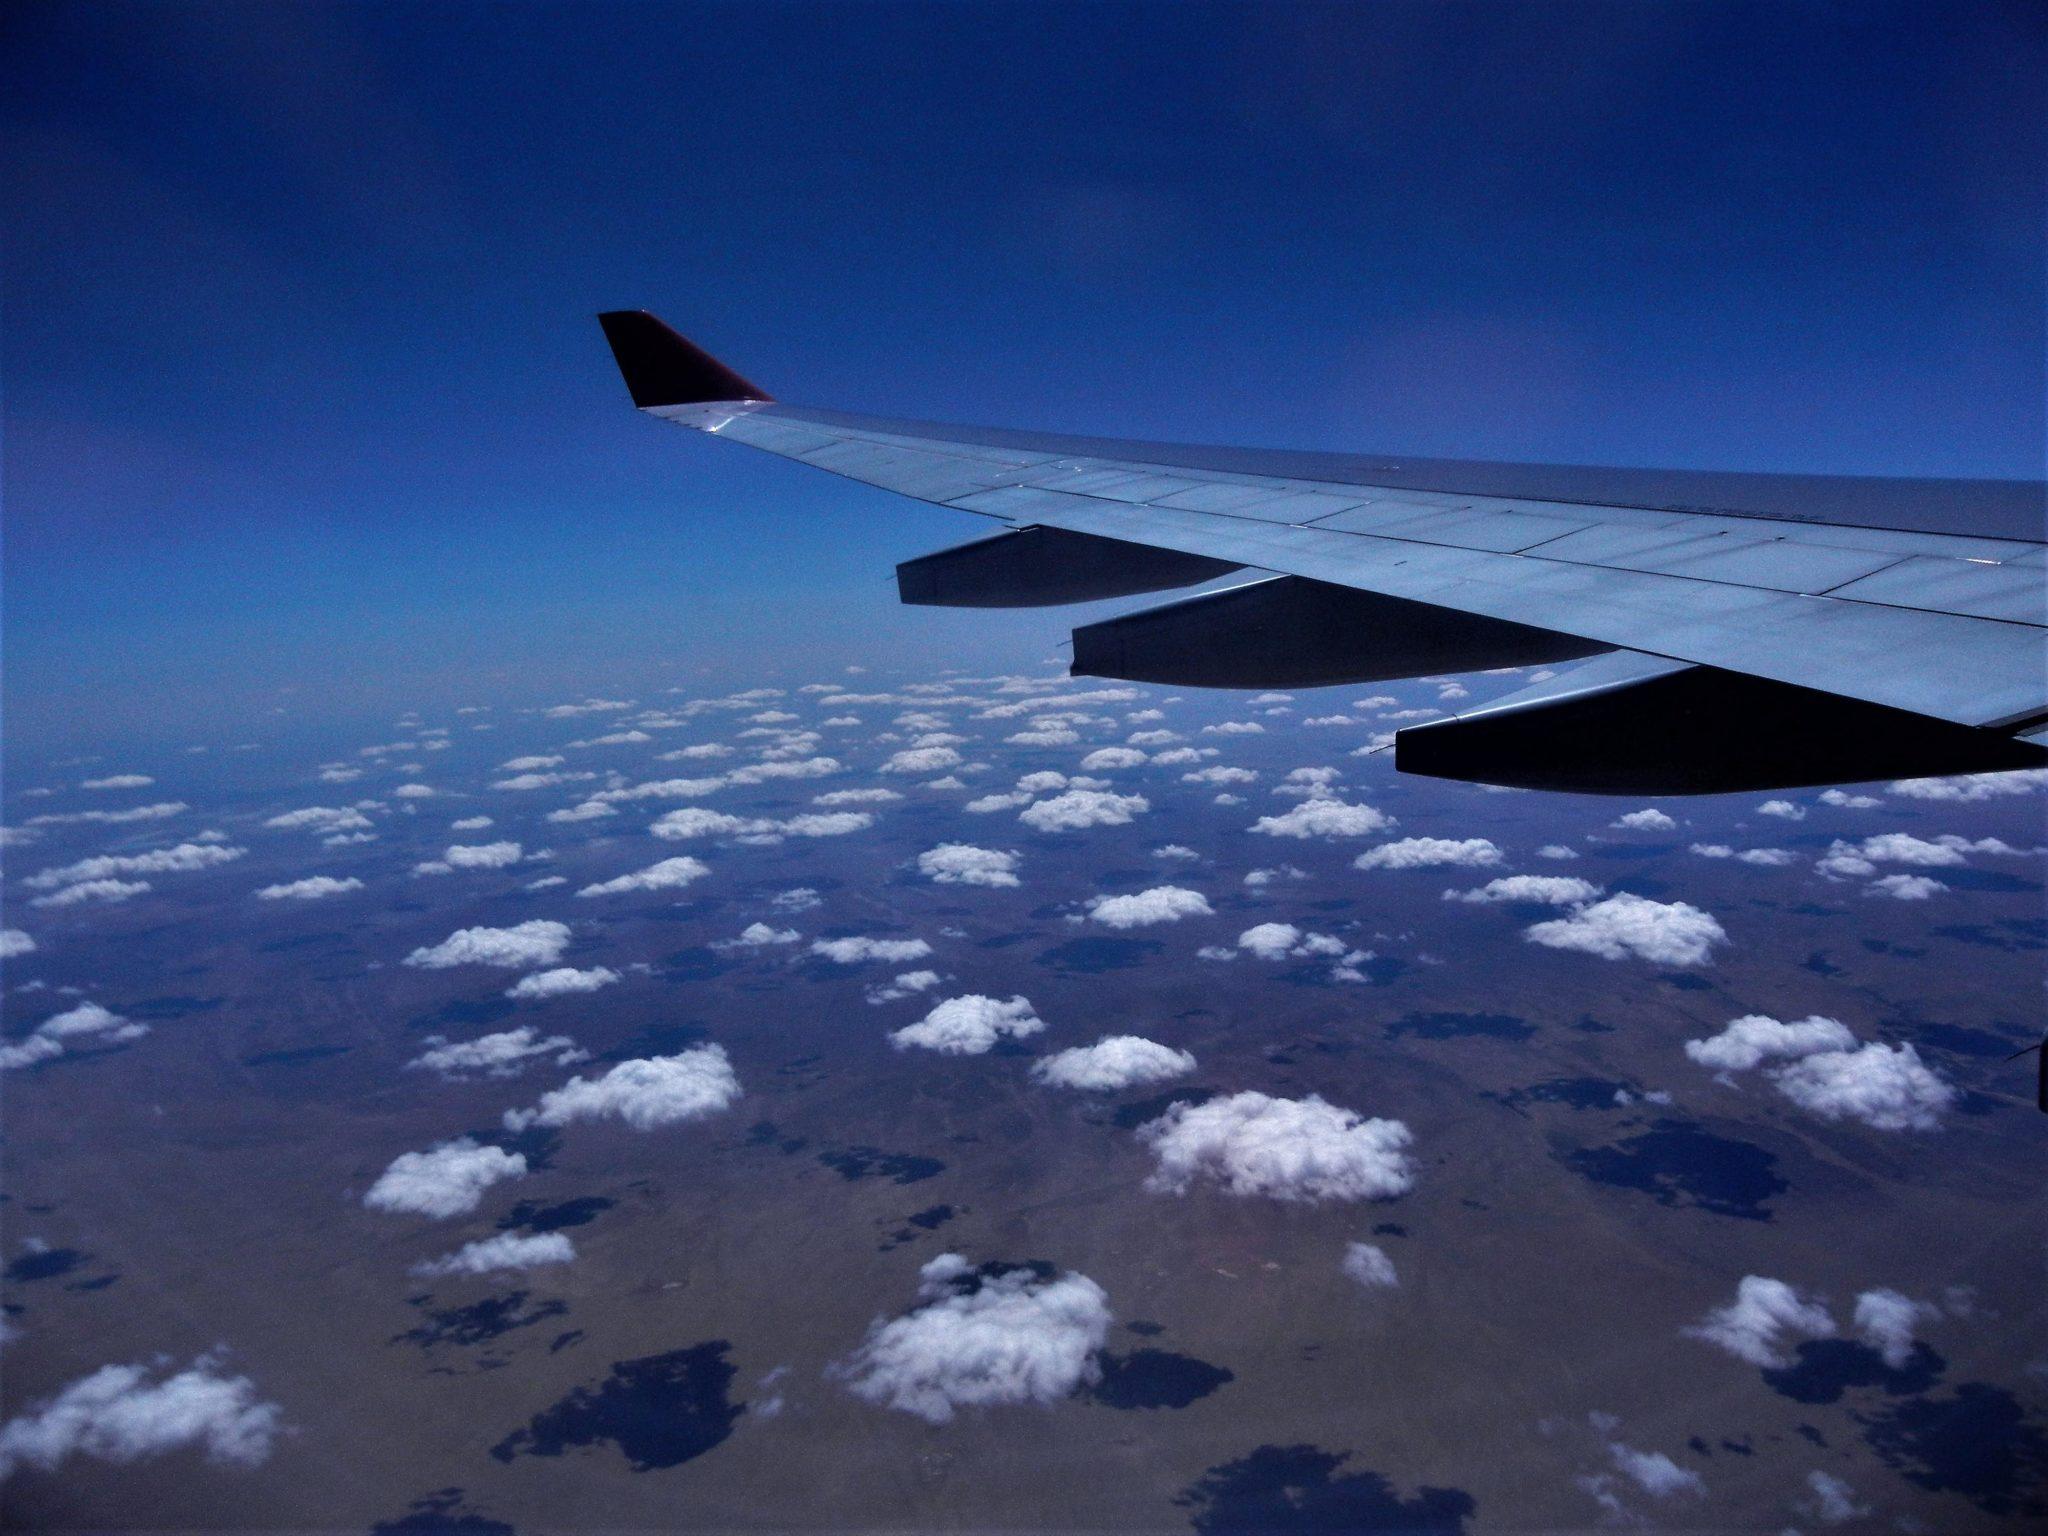 Pohled z letadla společnosti Ryanair